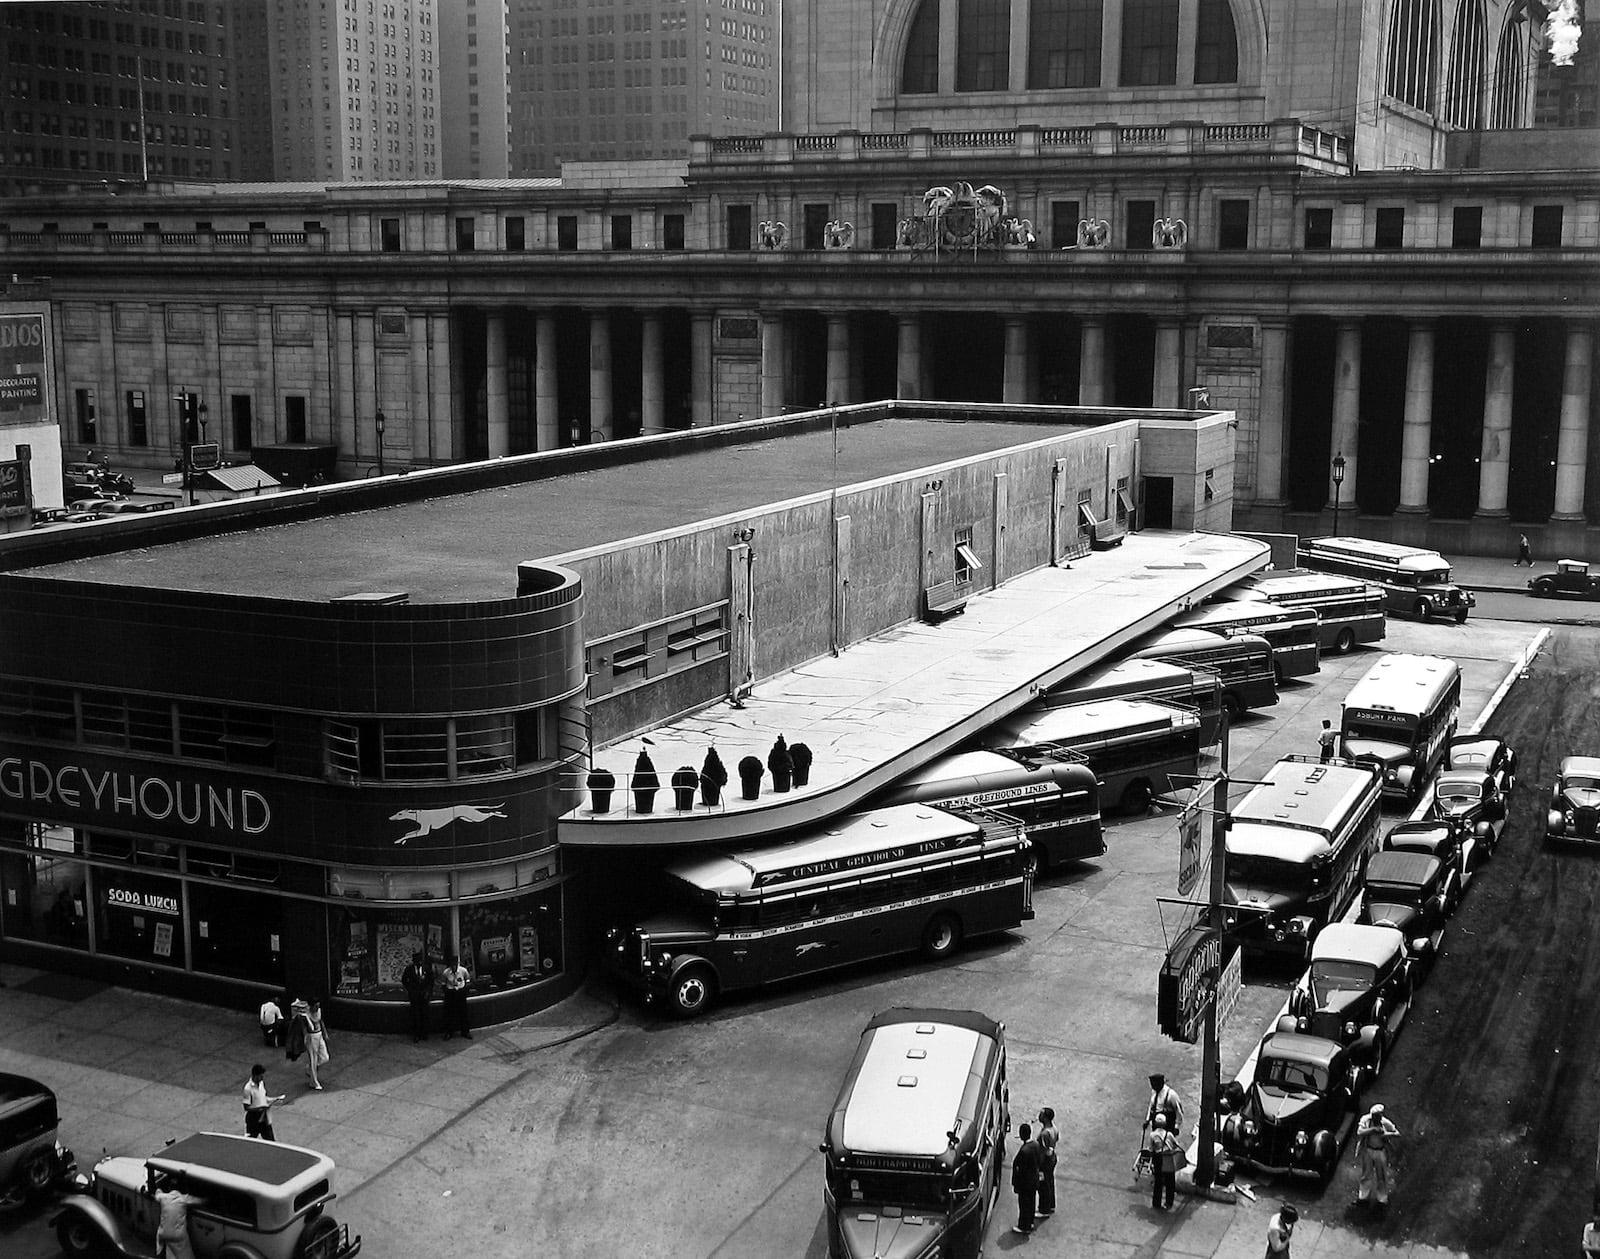 Berenice Abbott Greyhound Bus Terminal Tirage gélatino-argentique postérieur 49,3 x 39,2 cm Dim. papier: 61 x 76 cm